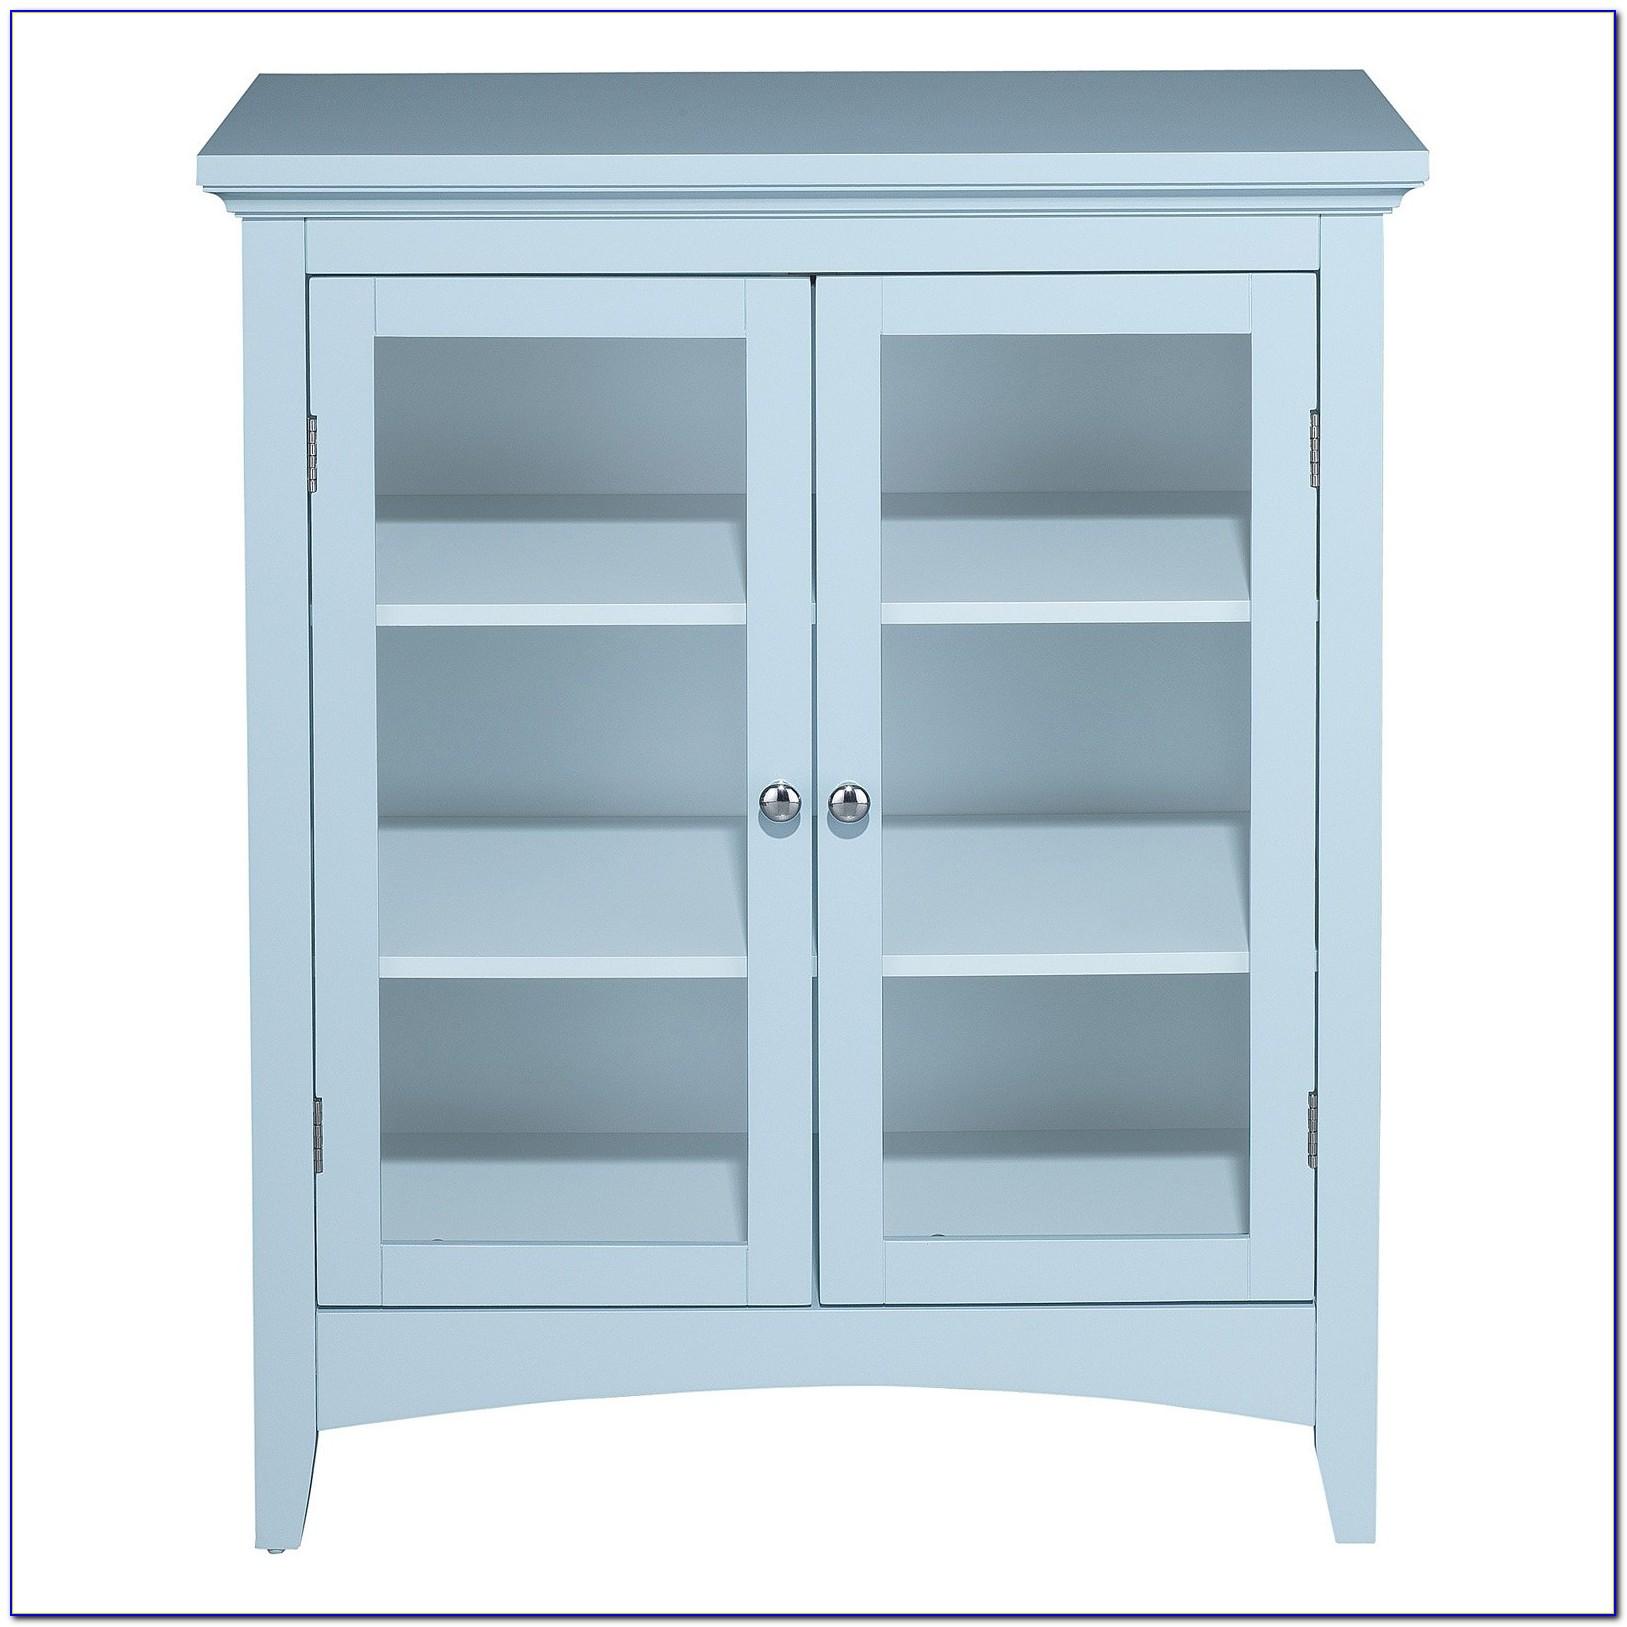 Bathroom Floor Storage Cabinet With Drawers